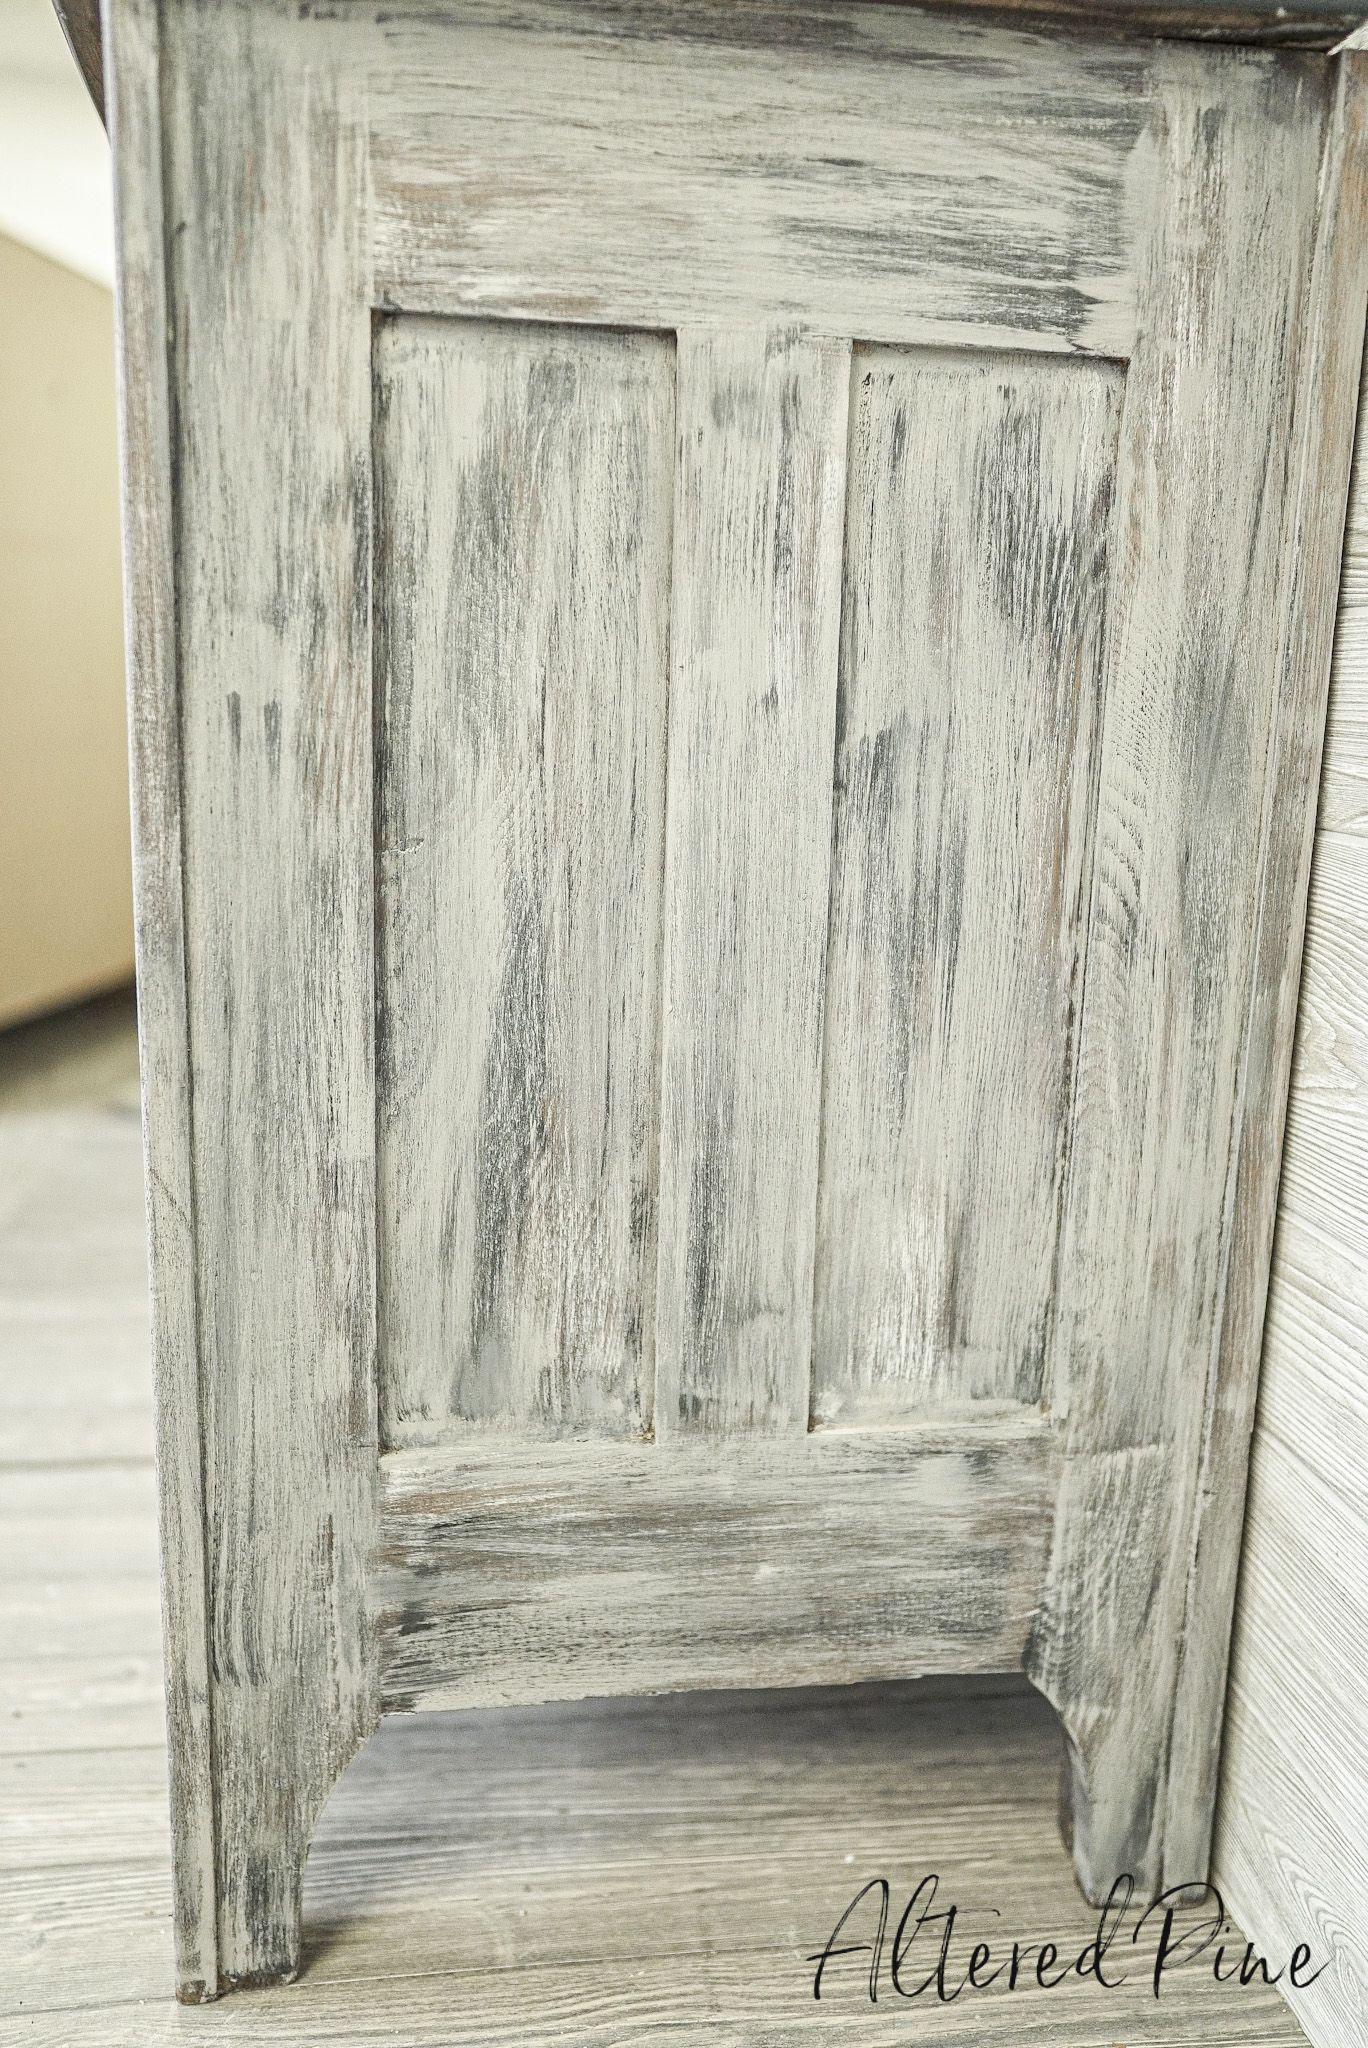 #alteredpine #painteddesk #refinishedfurniture #farmhousedecor #diy #distressedfurniture #rusticdecor #dailydecortags #chalkpaintedfurniture #diyhomedecor #hometohaven #farmhouse #home-decor #repurposedfurniture #chalkpaint #furnituretransformations #restoredfurniture #trashtotreasure #dixiebellepaint #salvagedfurniture #furnituremakeover #fromoldtonew #customorder #vintage #antiquefarmhouse #walldecor #girlswhobuild #woodprojects #Handmadedecor  #interiordesign   #paintedfurniture